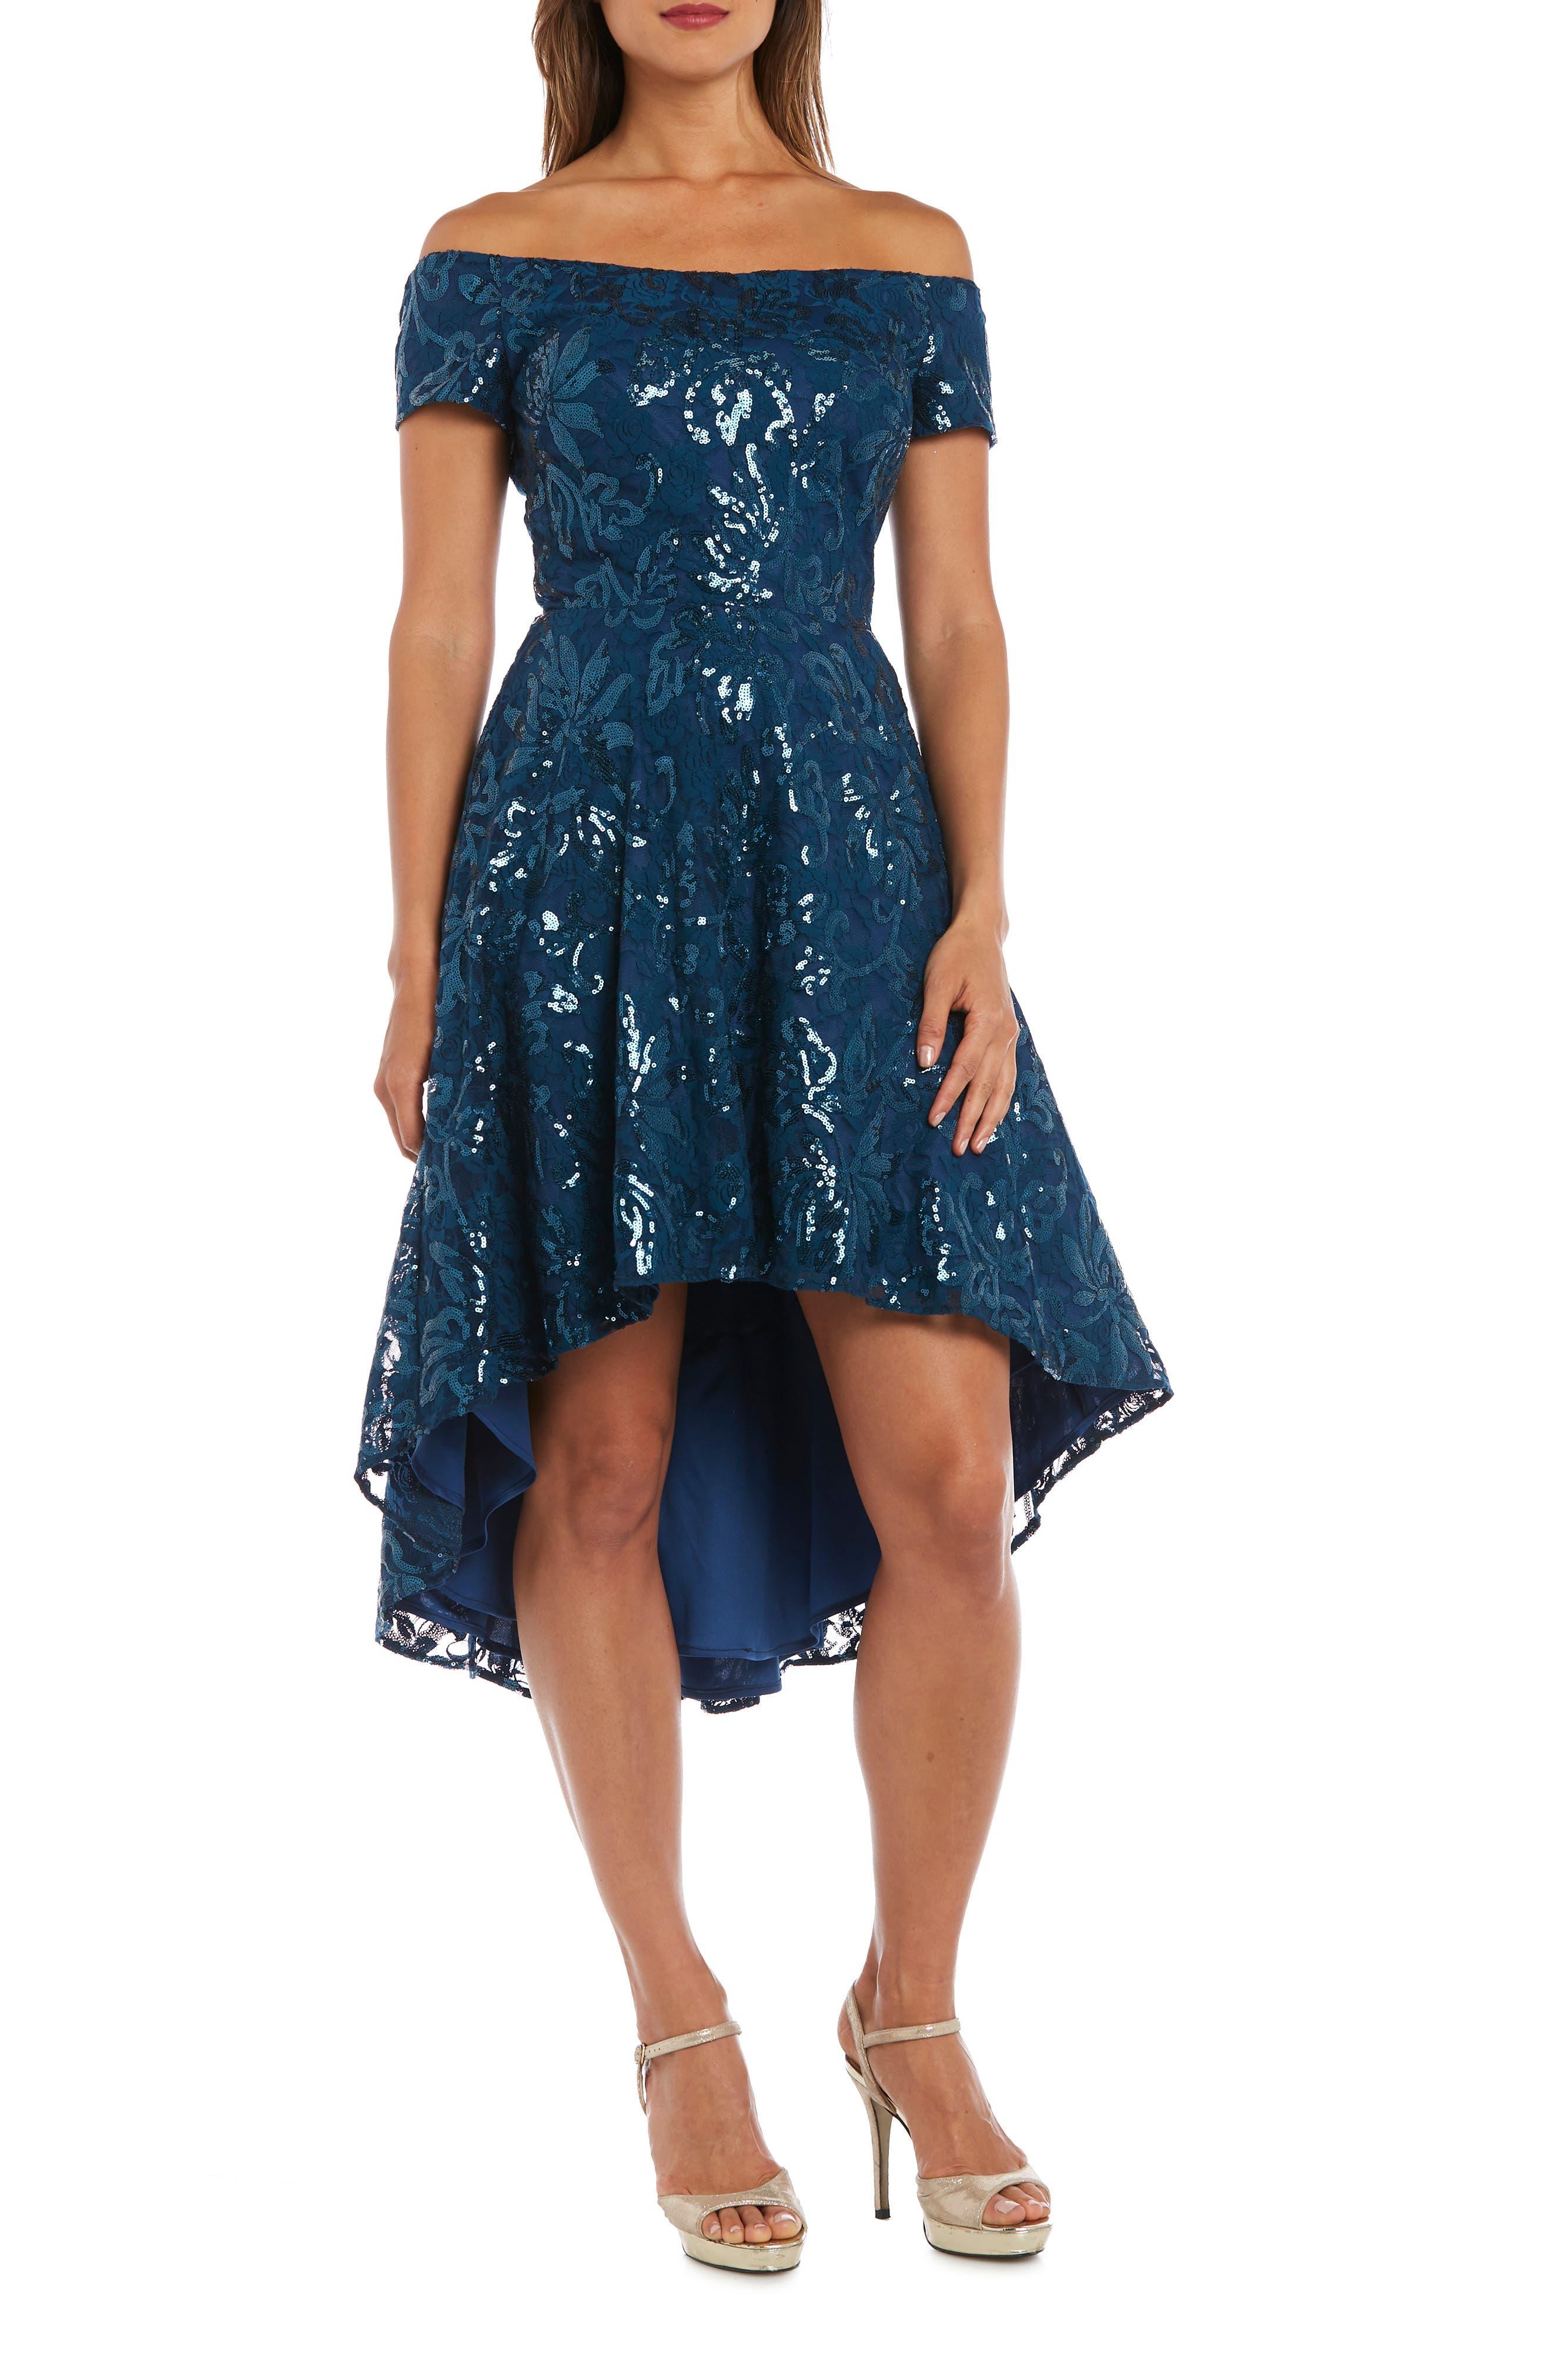 Morgan & Co. Sequin & Lace Off The Shoulder High/low Dress, Blue